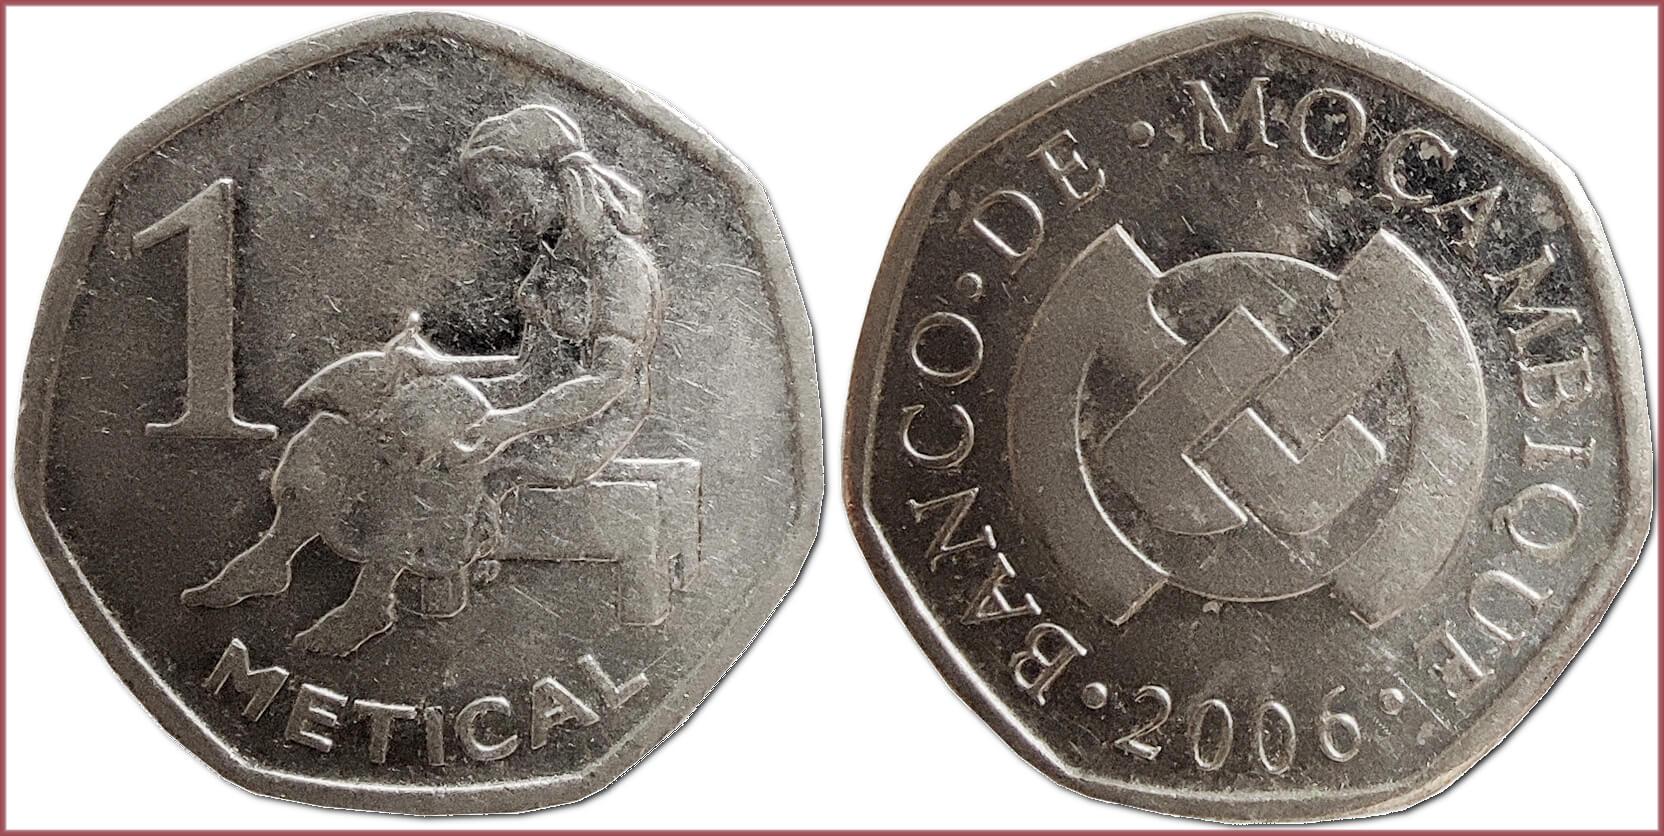 1 metical, 2006: Republic of Mozambique